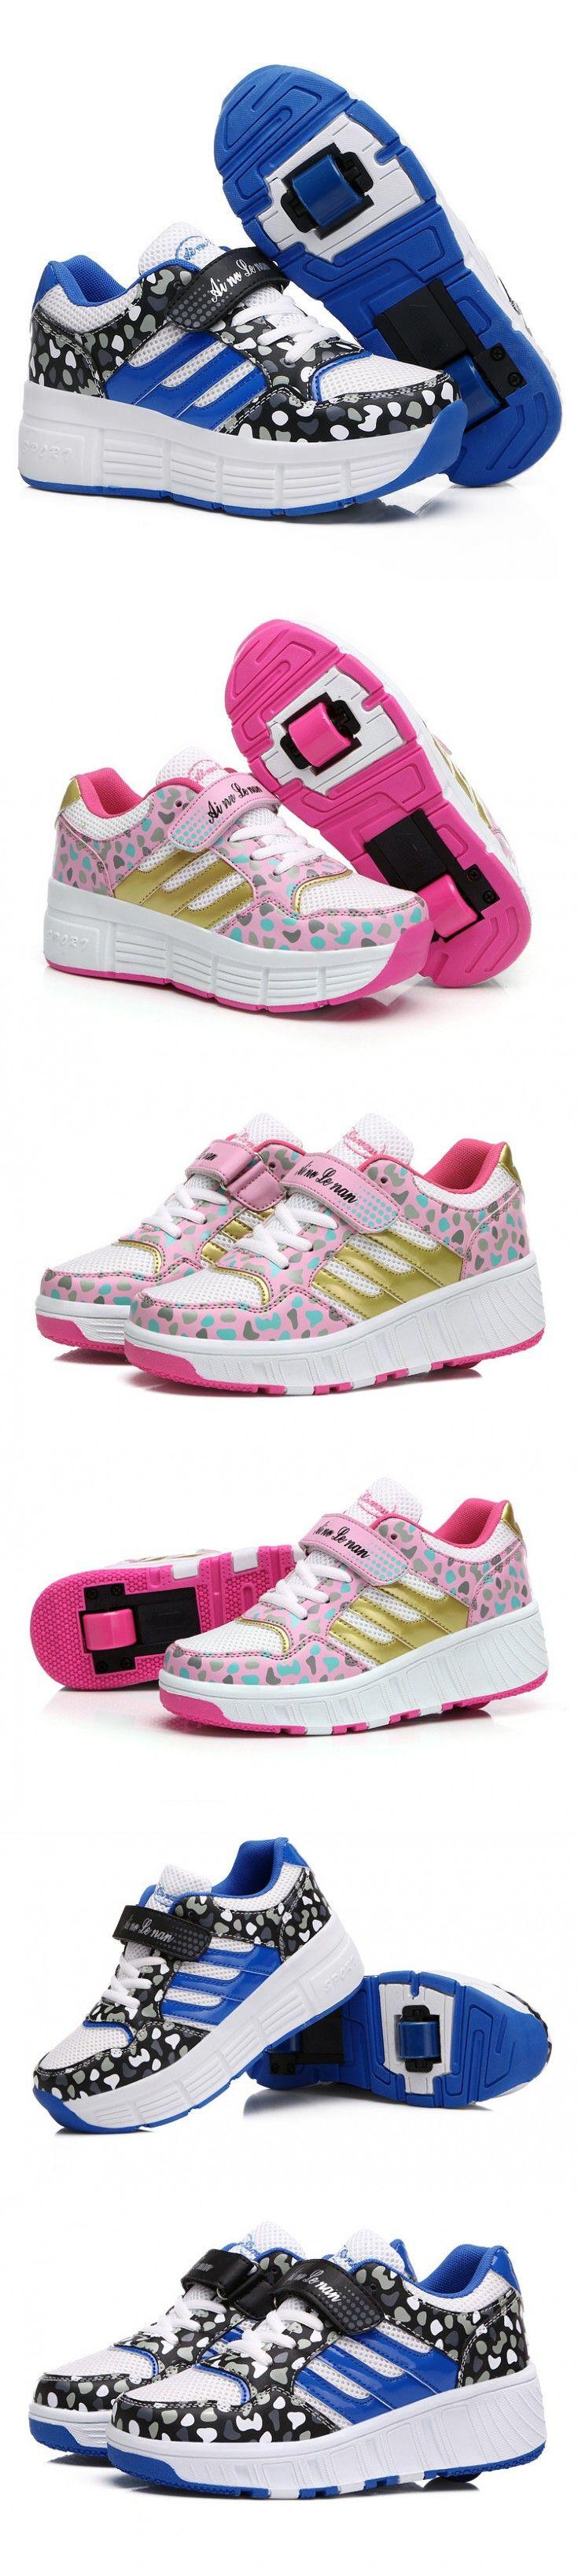 Roller shoes london - Children New Child Heelys Roller Shoes With Wheels Kids Shoes For Children Boys Girls Zapatillas Zapatos De Ruedas G100